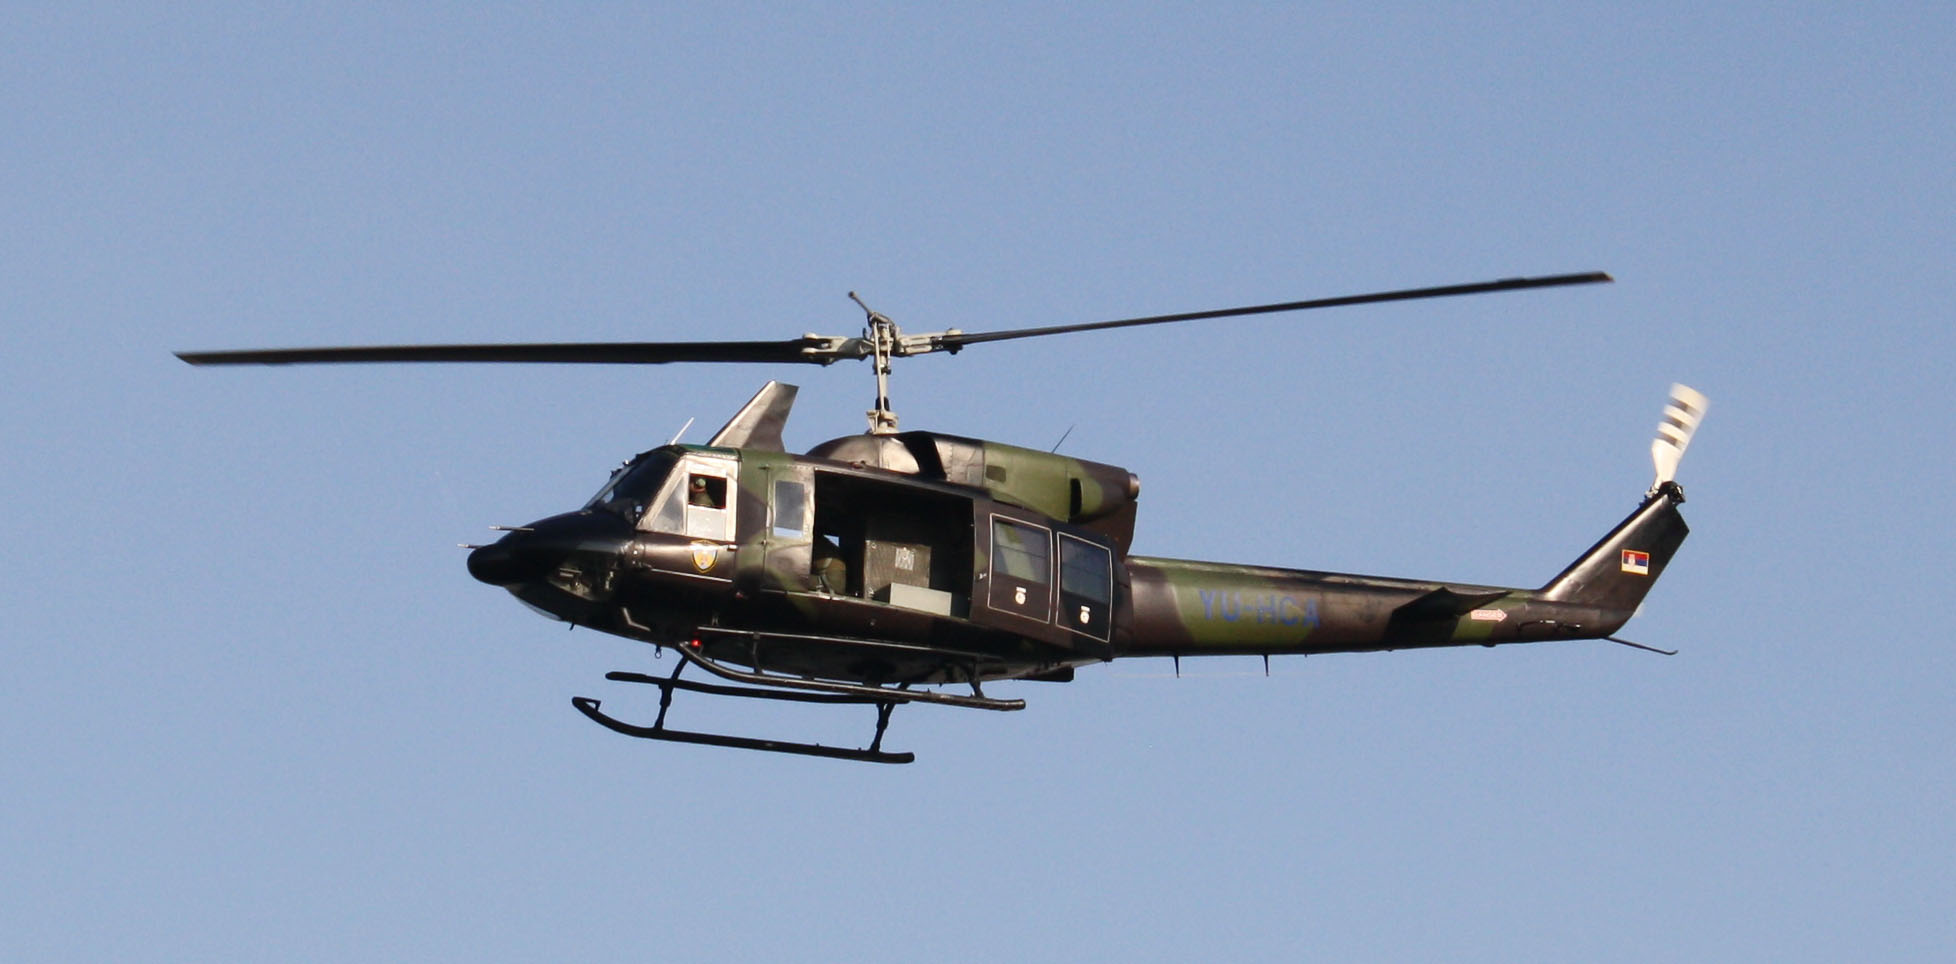 Elicottero Dat3 : File ab yu hca mup srbije g wikimedia commons